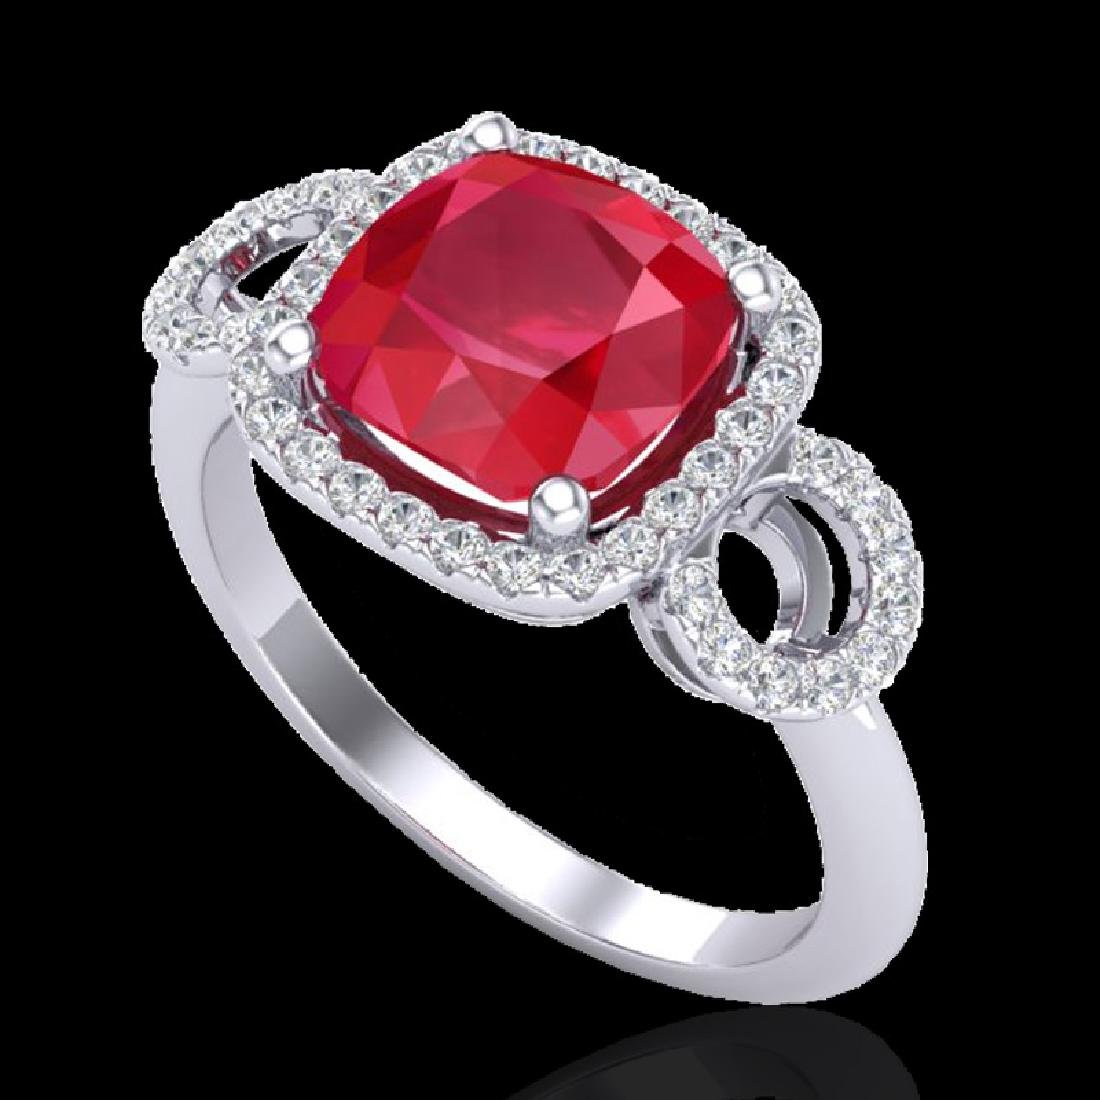 3.15 CTW Ruby & Micro VS/SI Diamond Ring 18K White Gold - 2